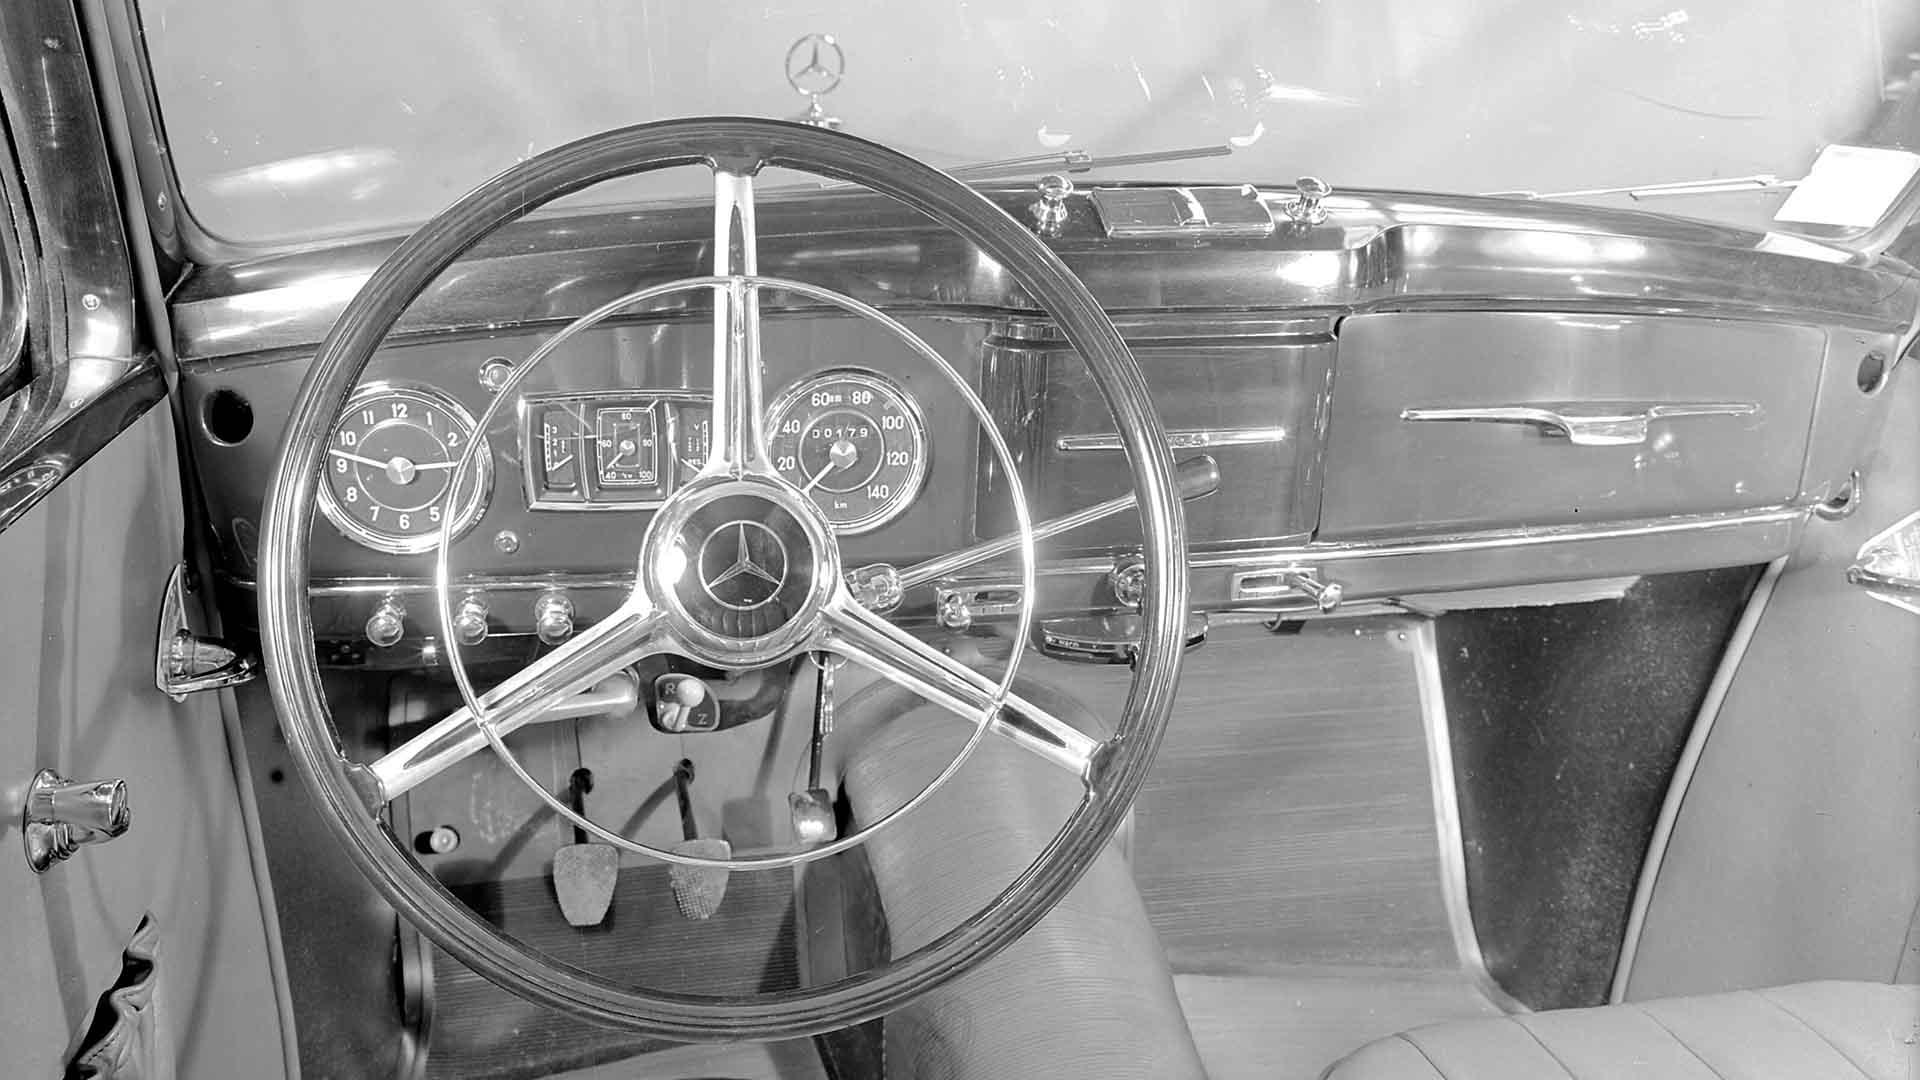 Mercedes-Benz W191 170 Sb